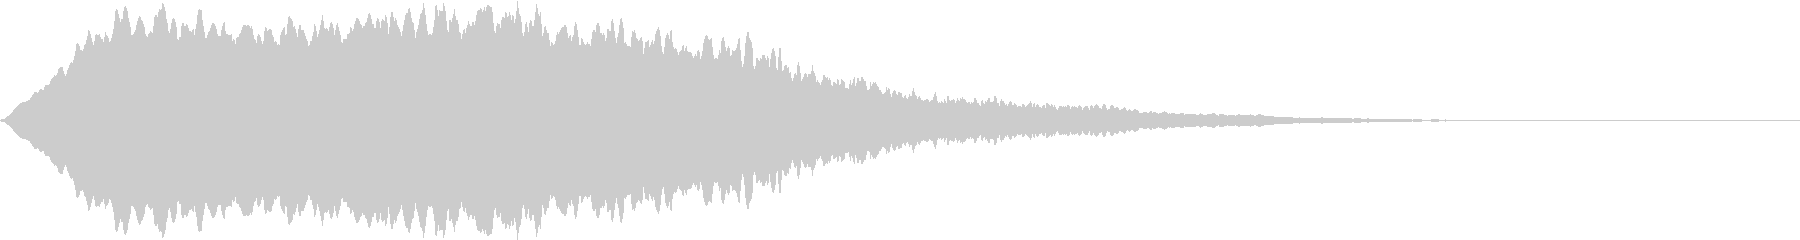 SFX ケミカルな昭和特撮風パッド 3の未再生の波形